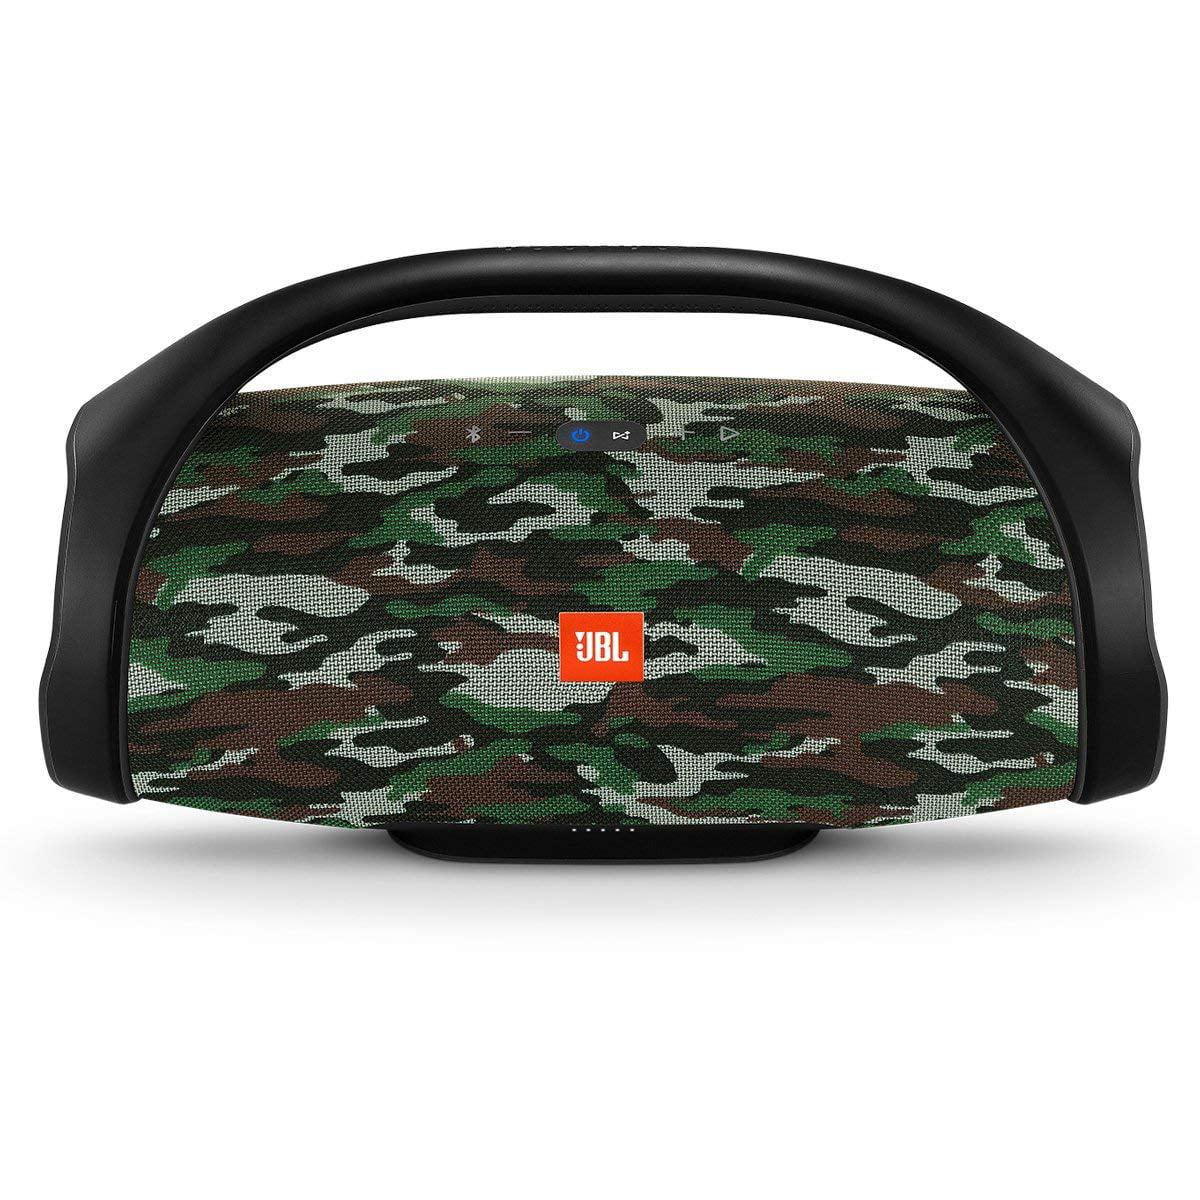 JBLBOOMBOXSQUA JBL Boombox Portable Bluetooth Waterproof Speaker (Camouflage) by JBL